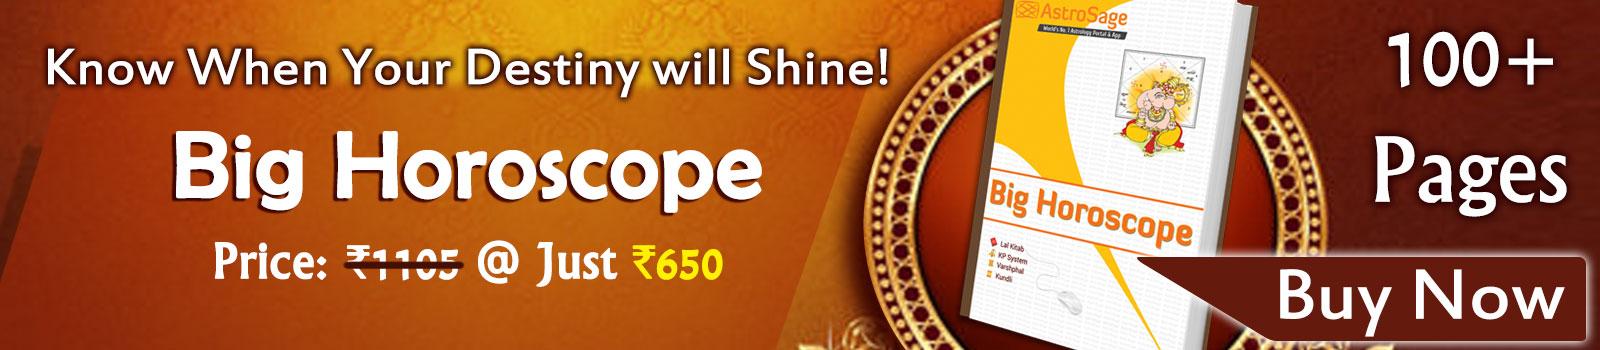 Big Horoscope - Key To Your Bright Destiny